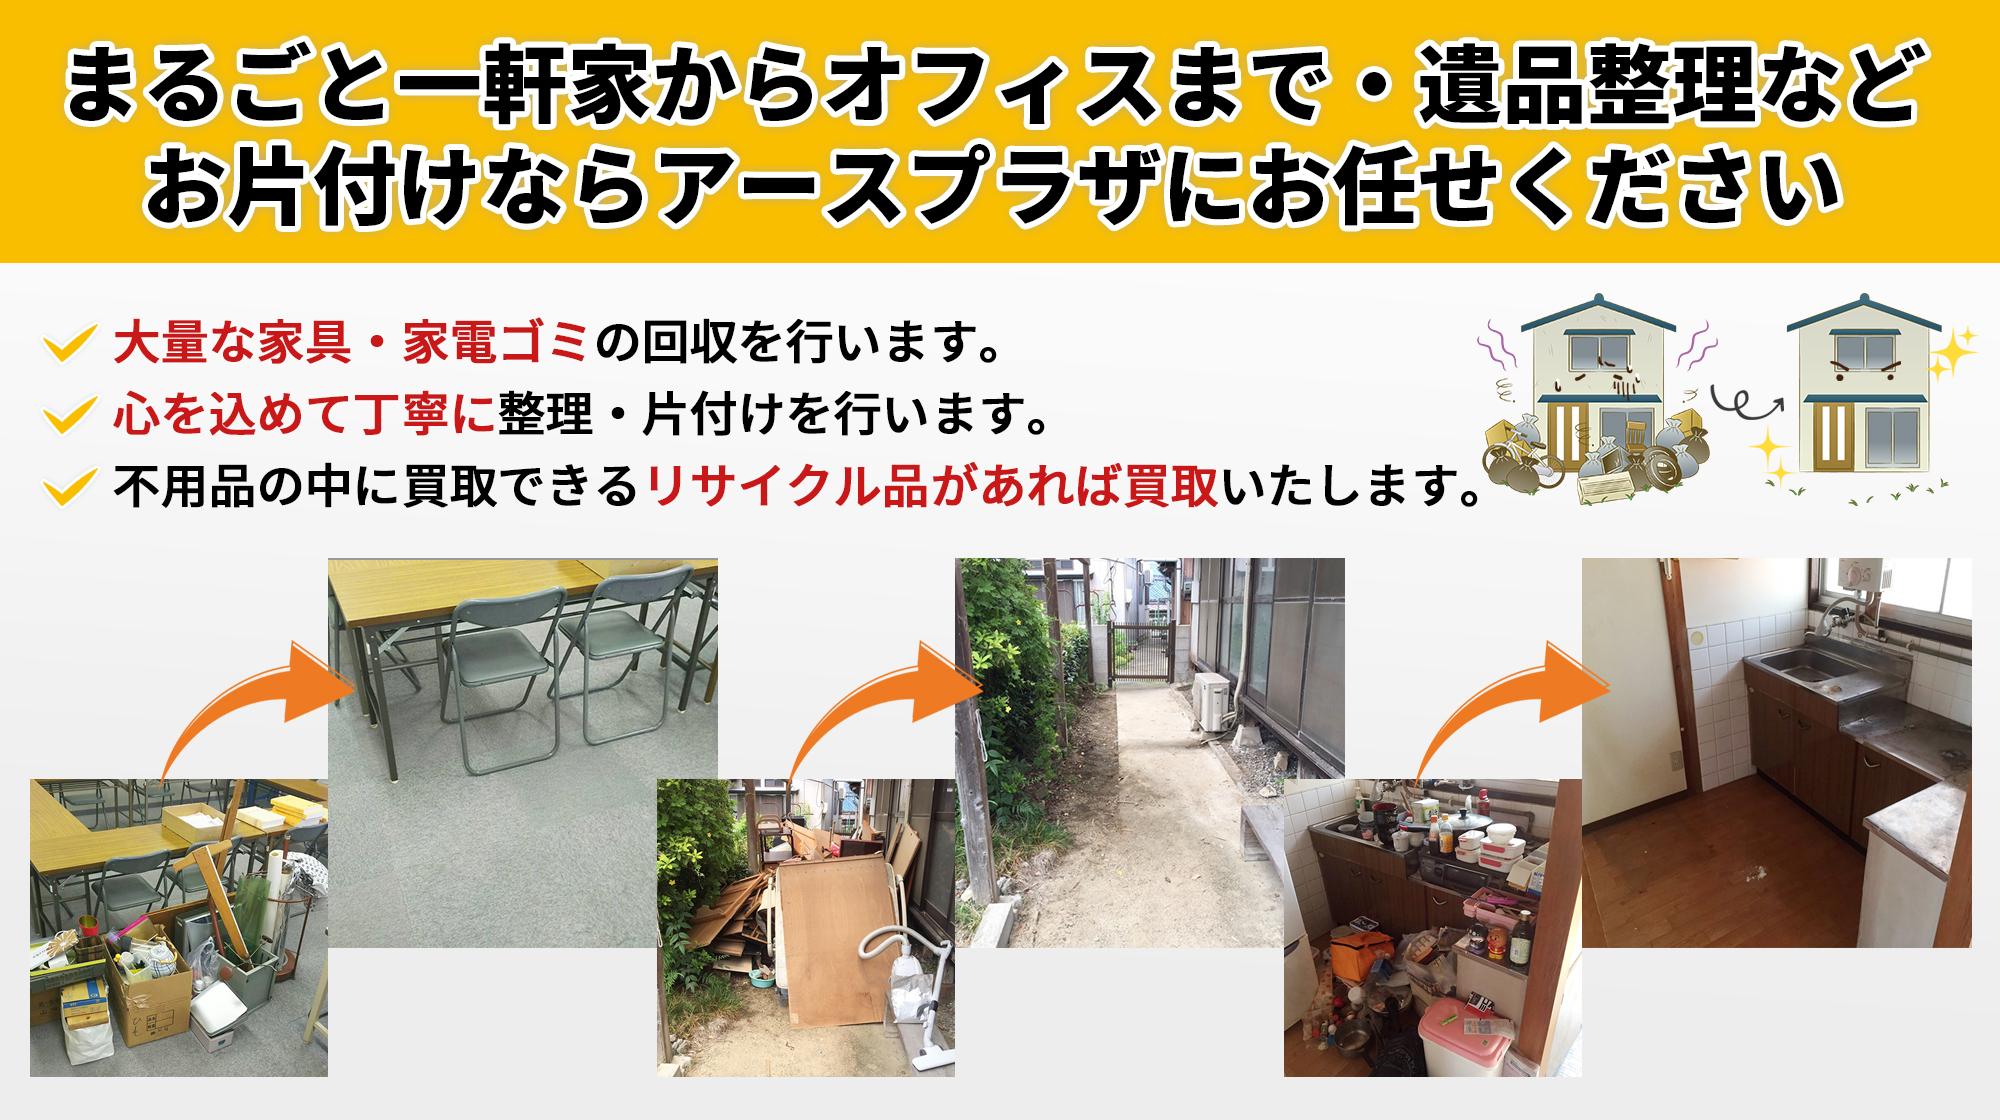 不 用品 回収 北九州 【楽天市場】ワンズマート楽天市場店